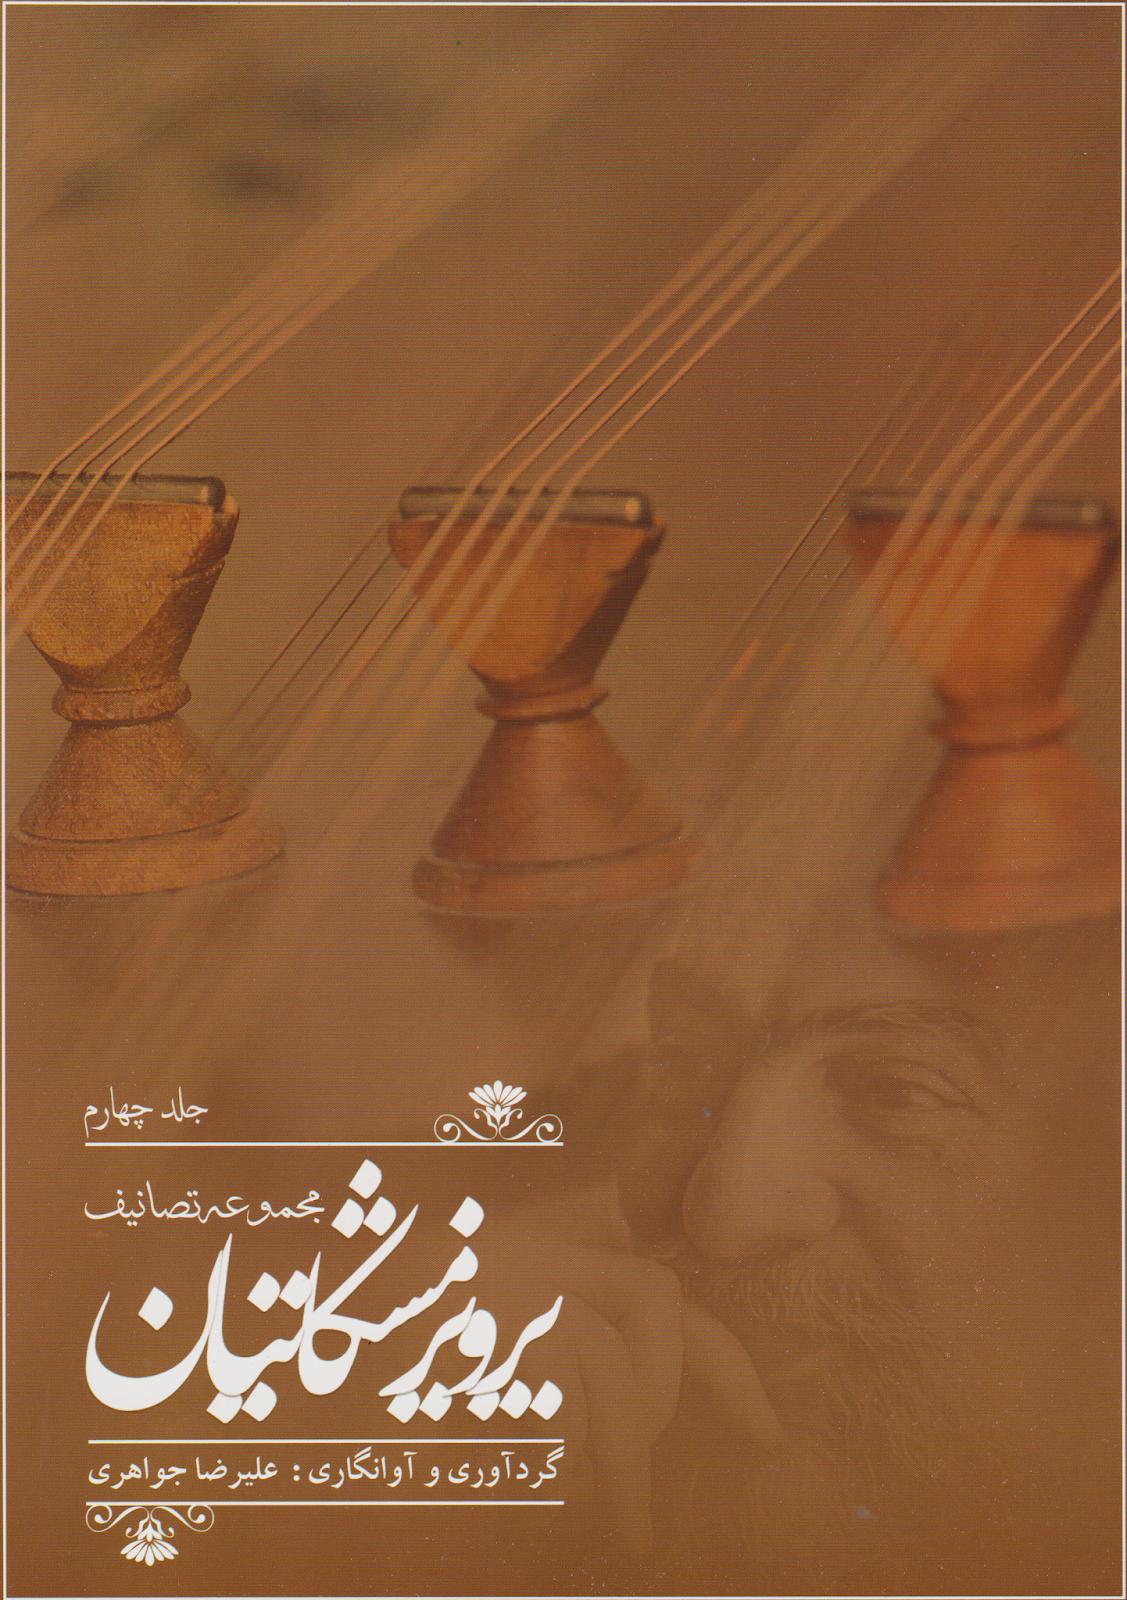 کتاب مجموعه تصانیف پرویز مشکاتیان جلد 4 (چهارم) گردآوری علیرضا جواهری انتشارات چکاد هنر